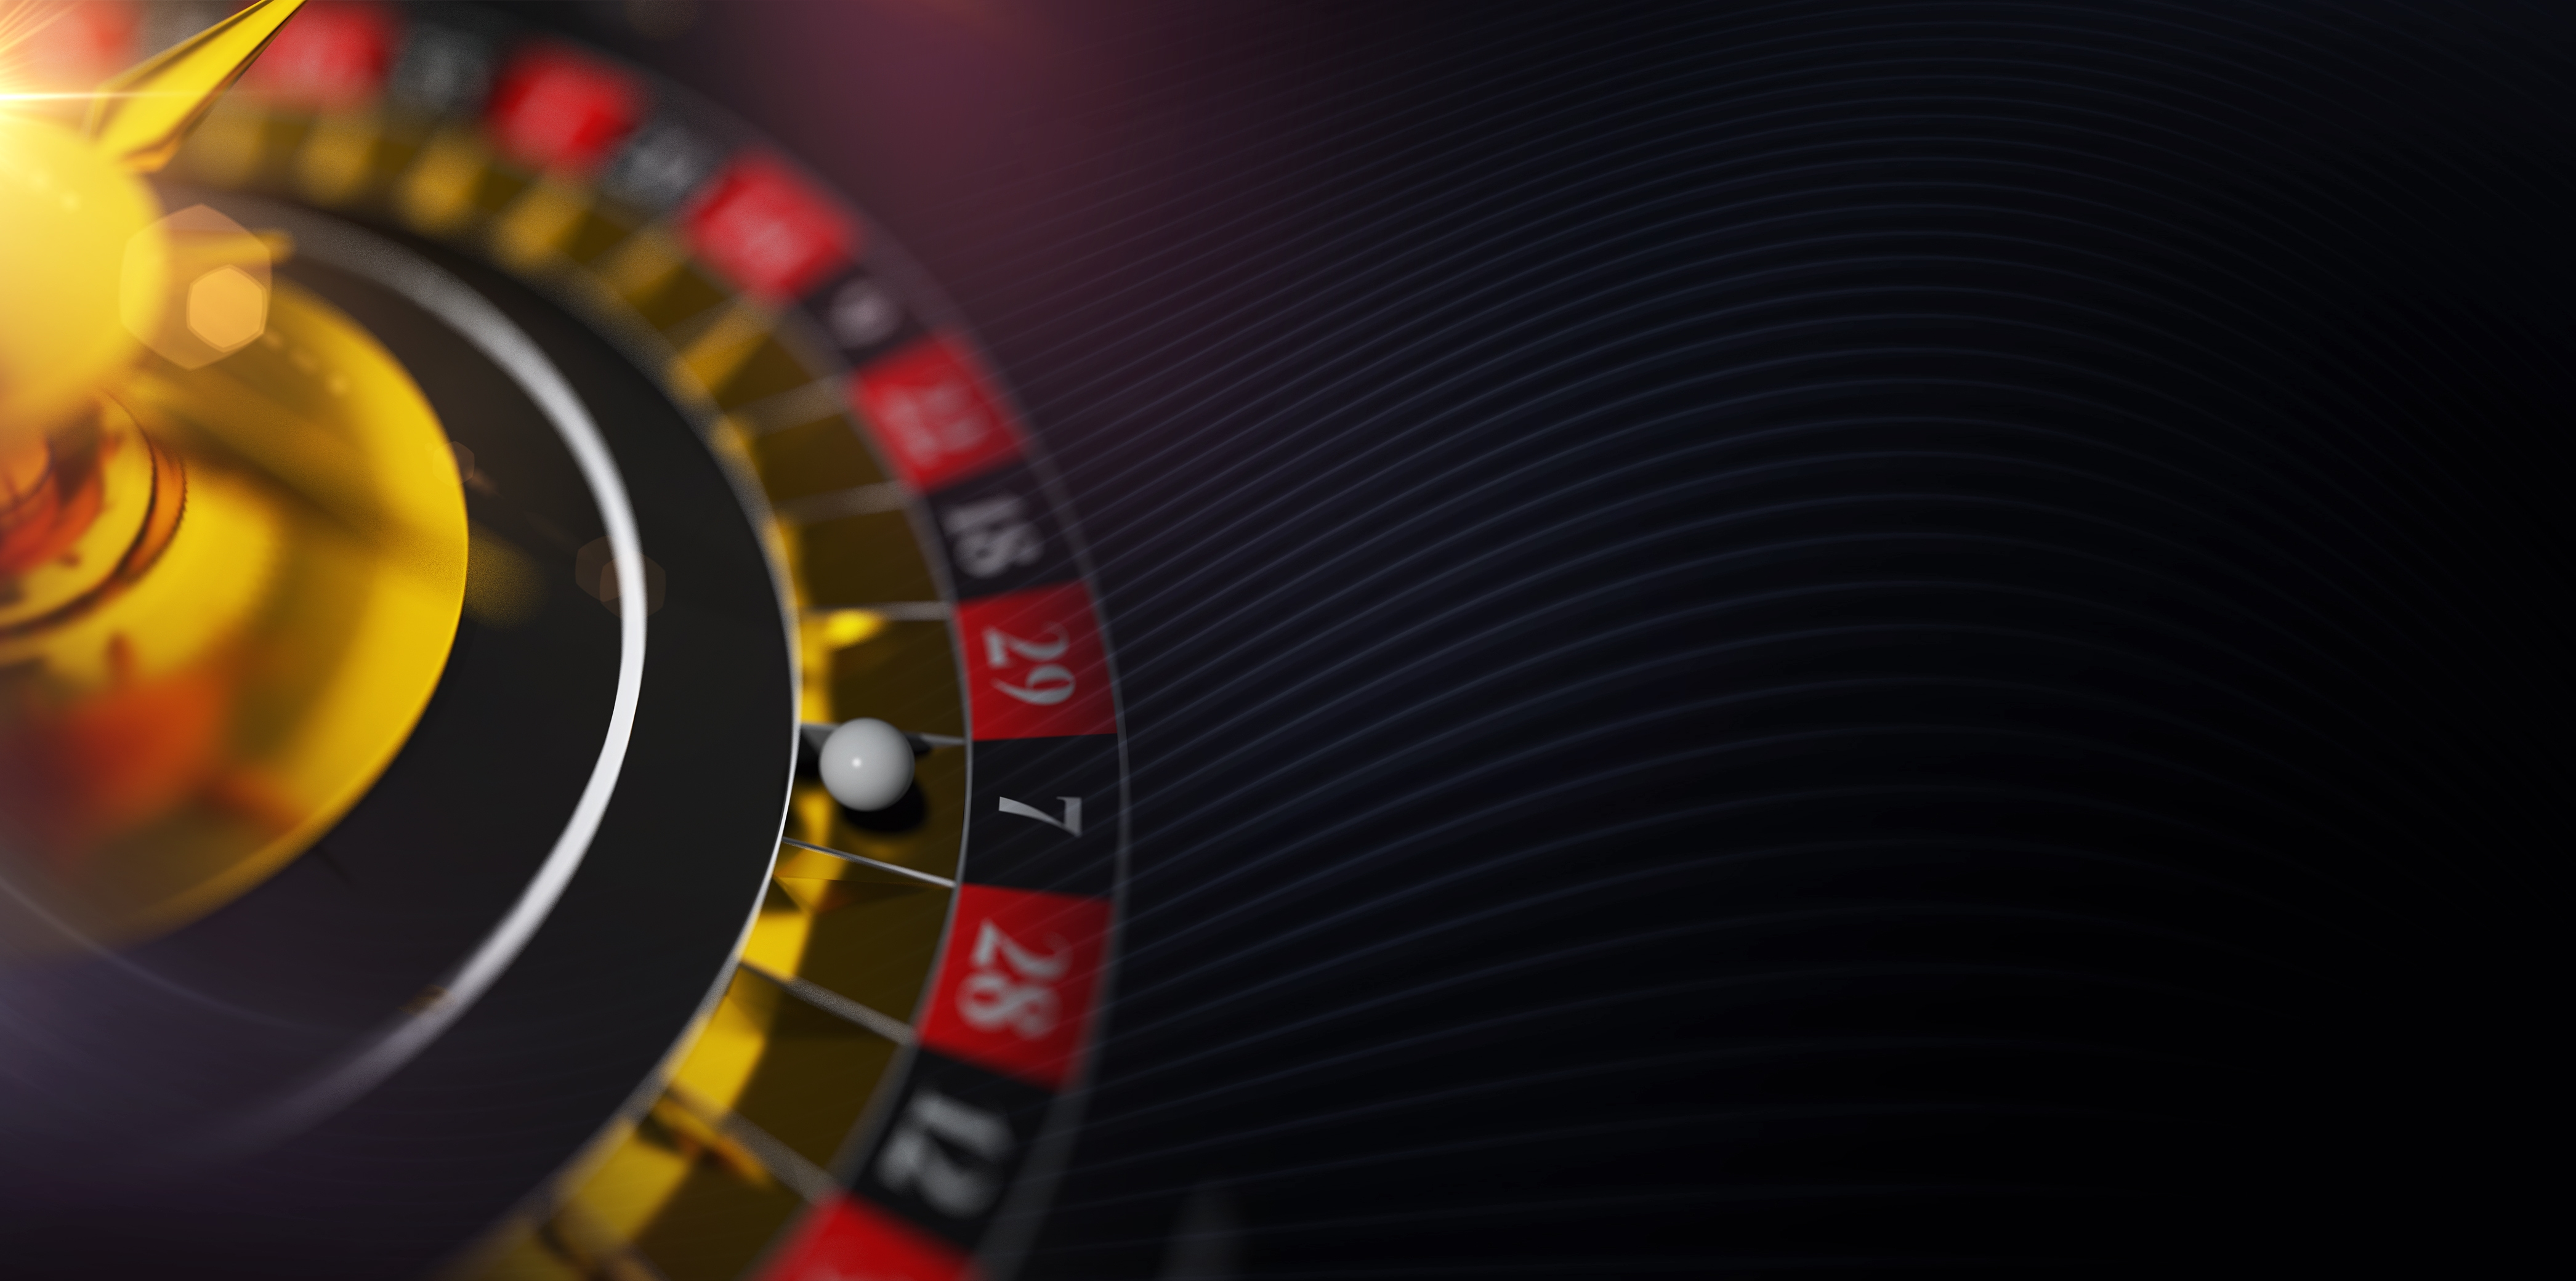 App store free slot games